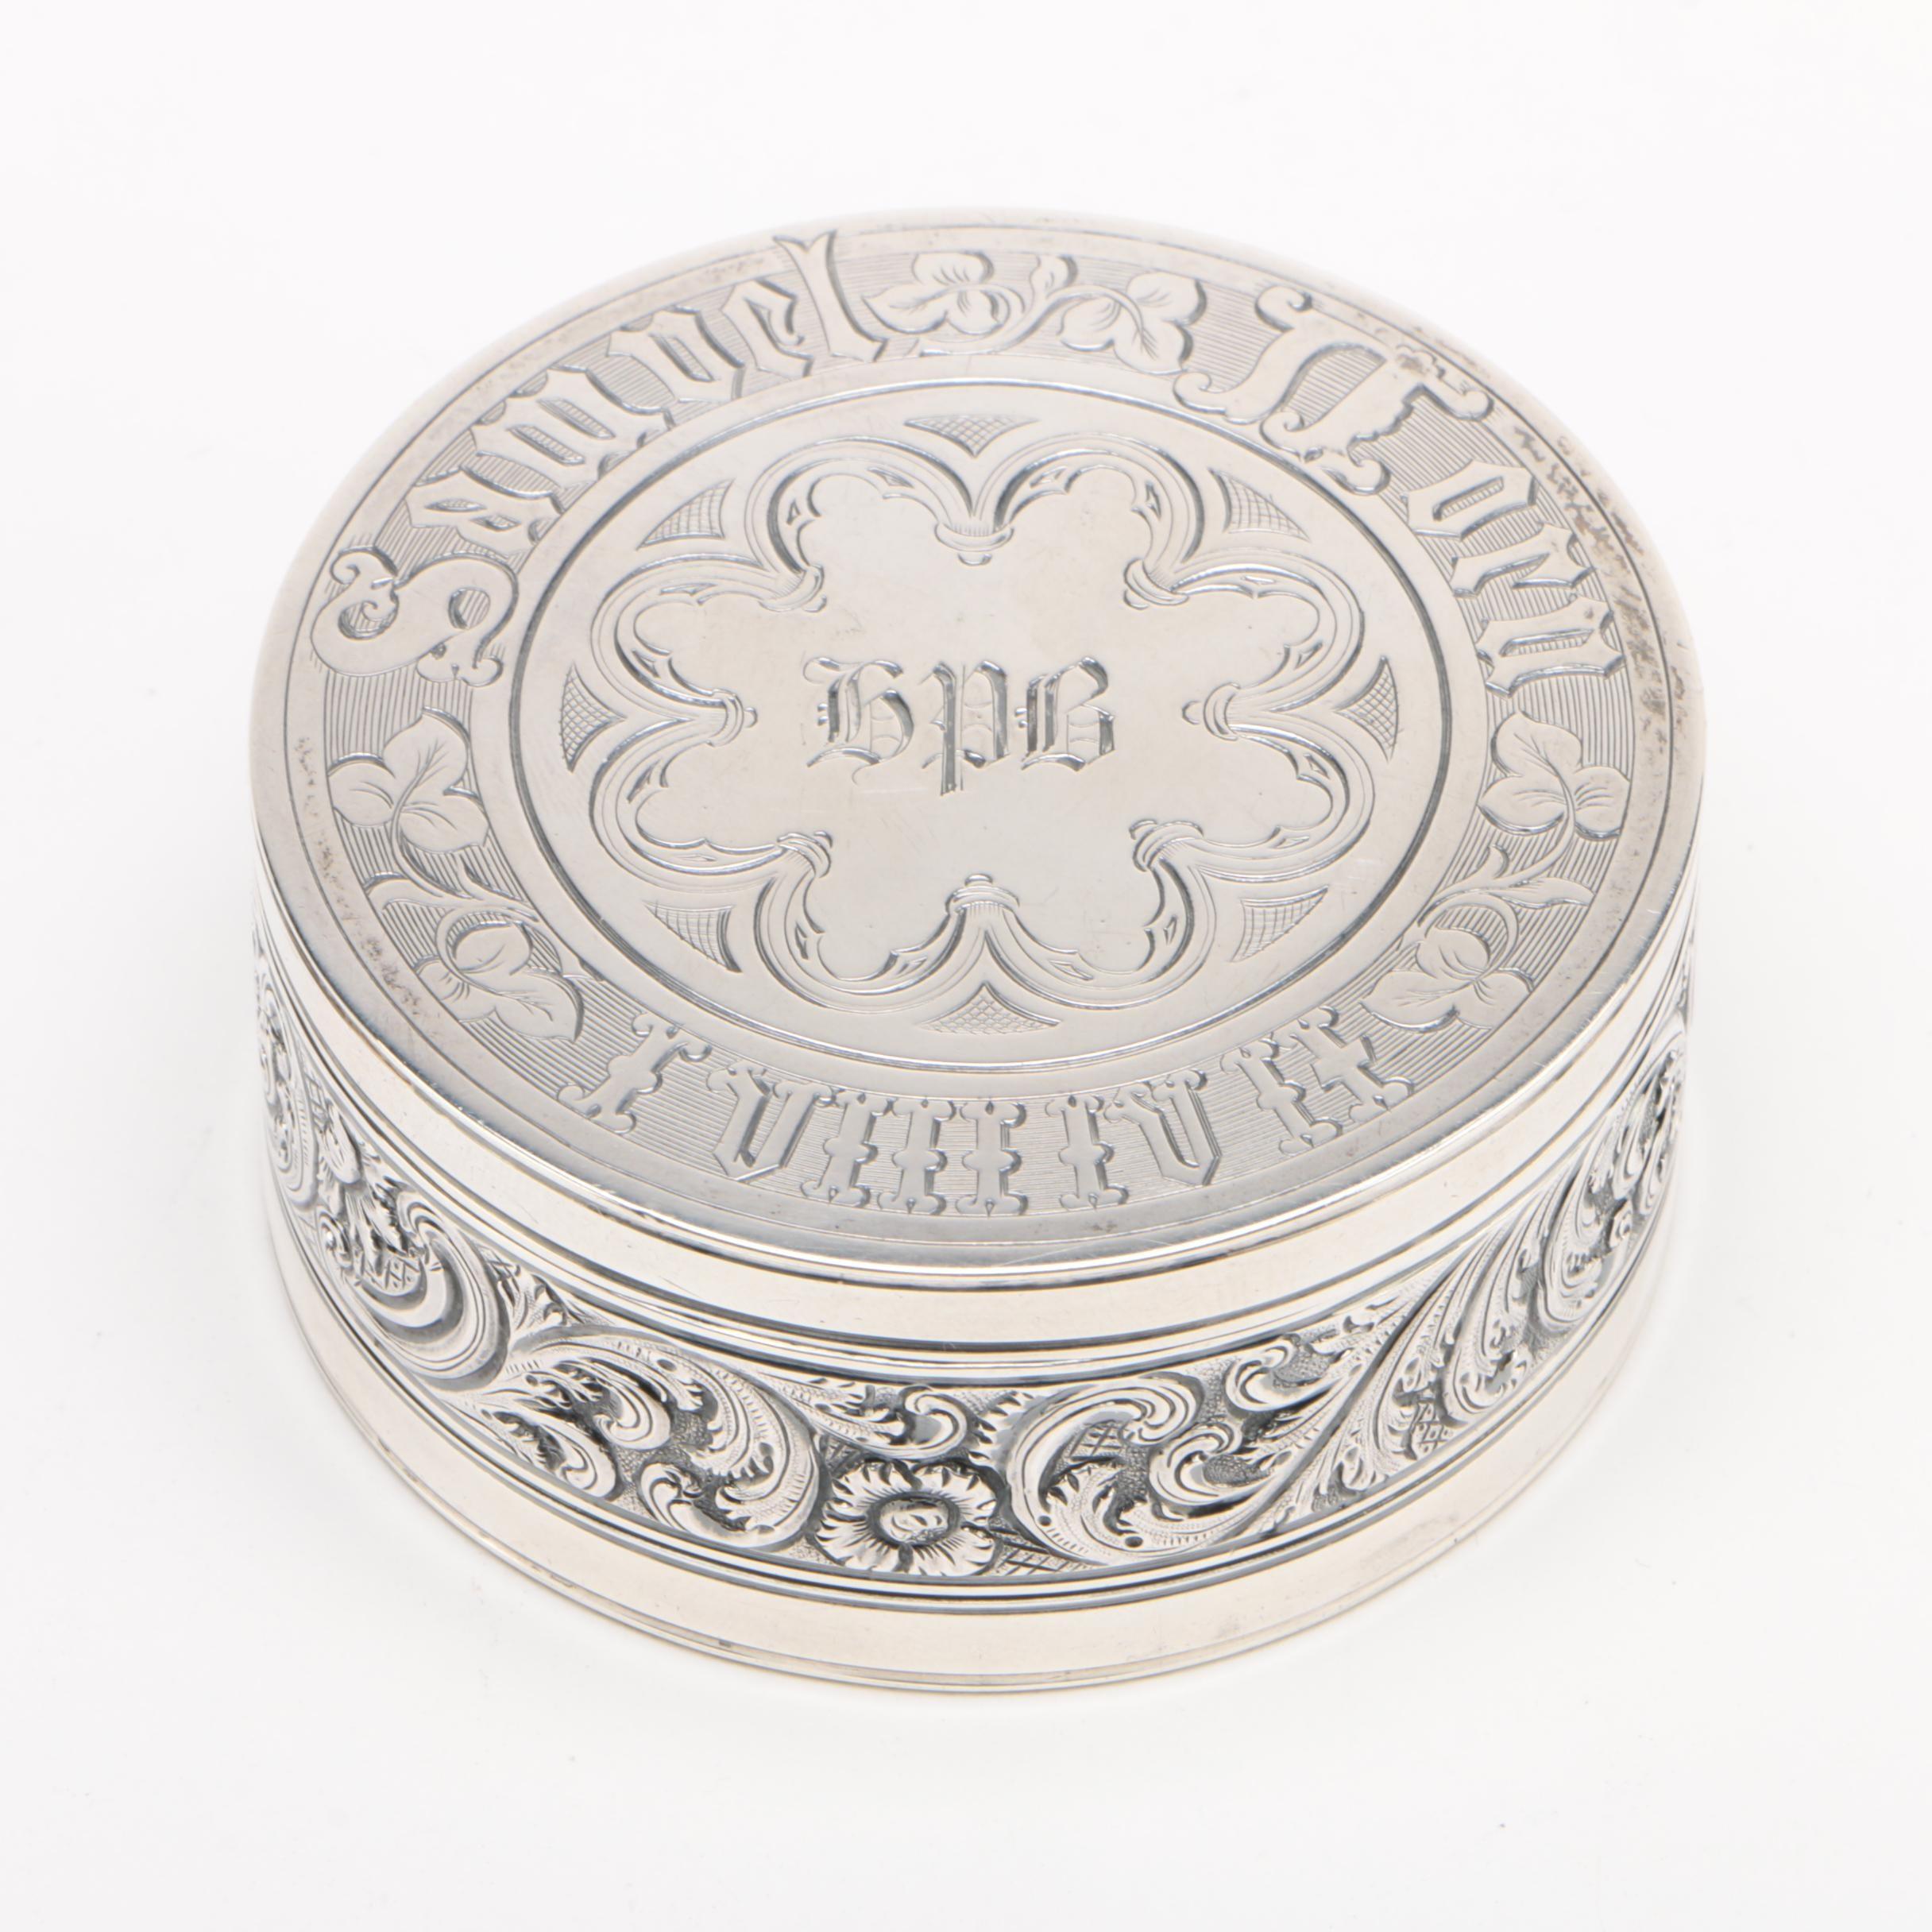 John Angell II & George Angell English Sterling Gentlemen's Vanity Box, 1848